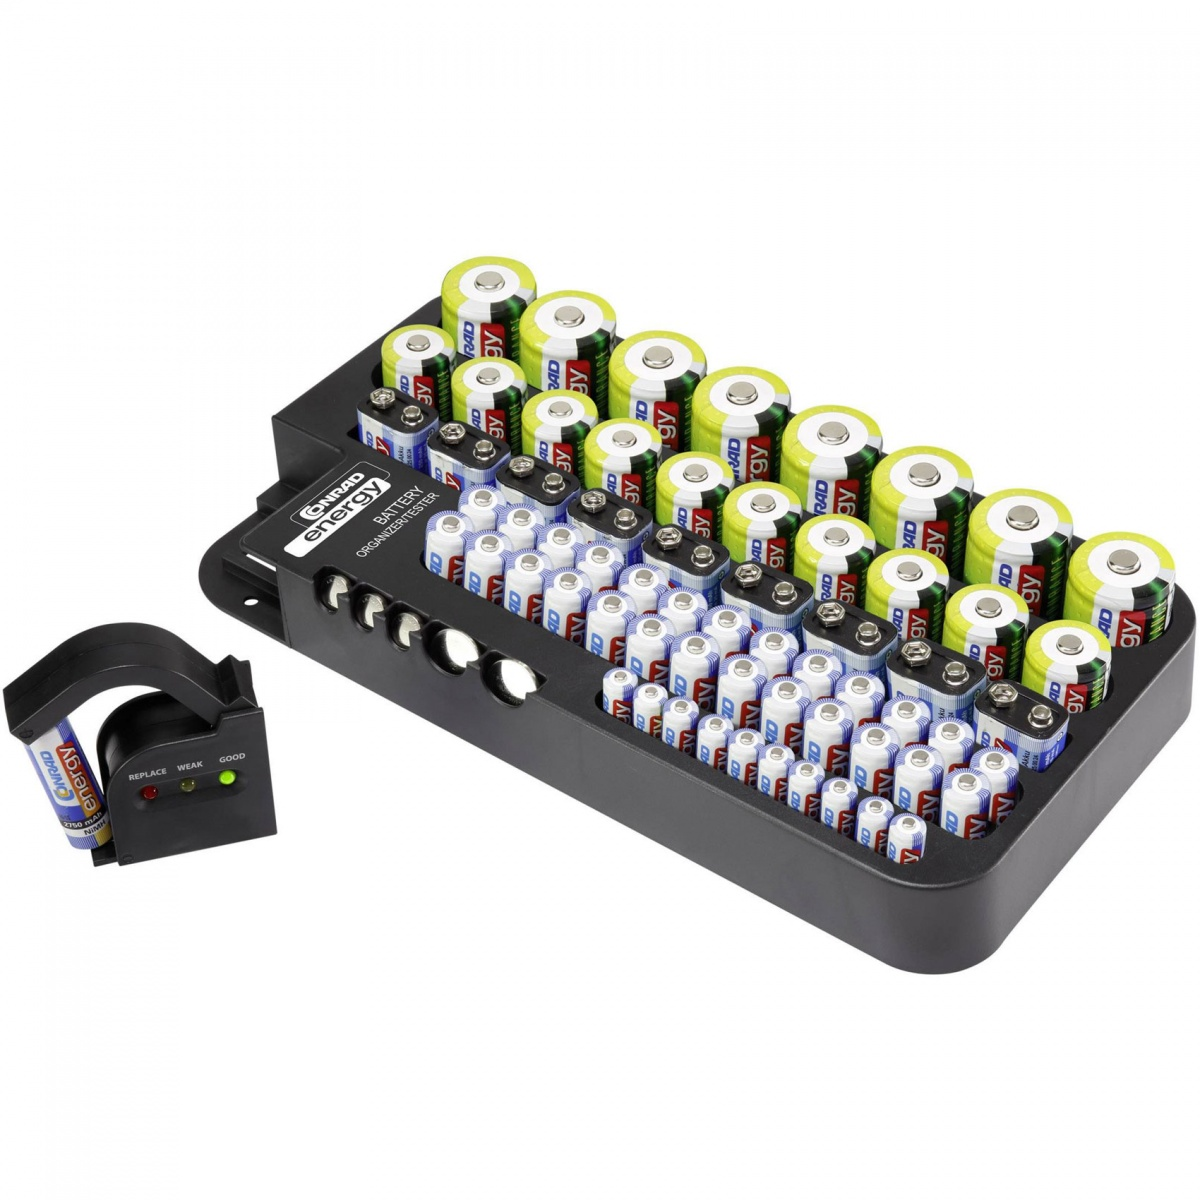 Conrad Battery Organizer And Tester - Black